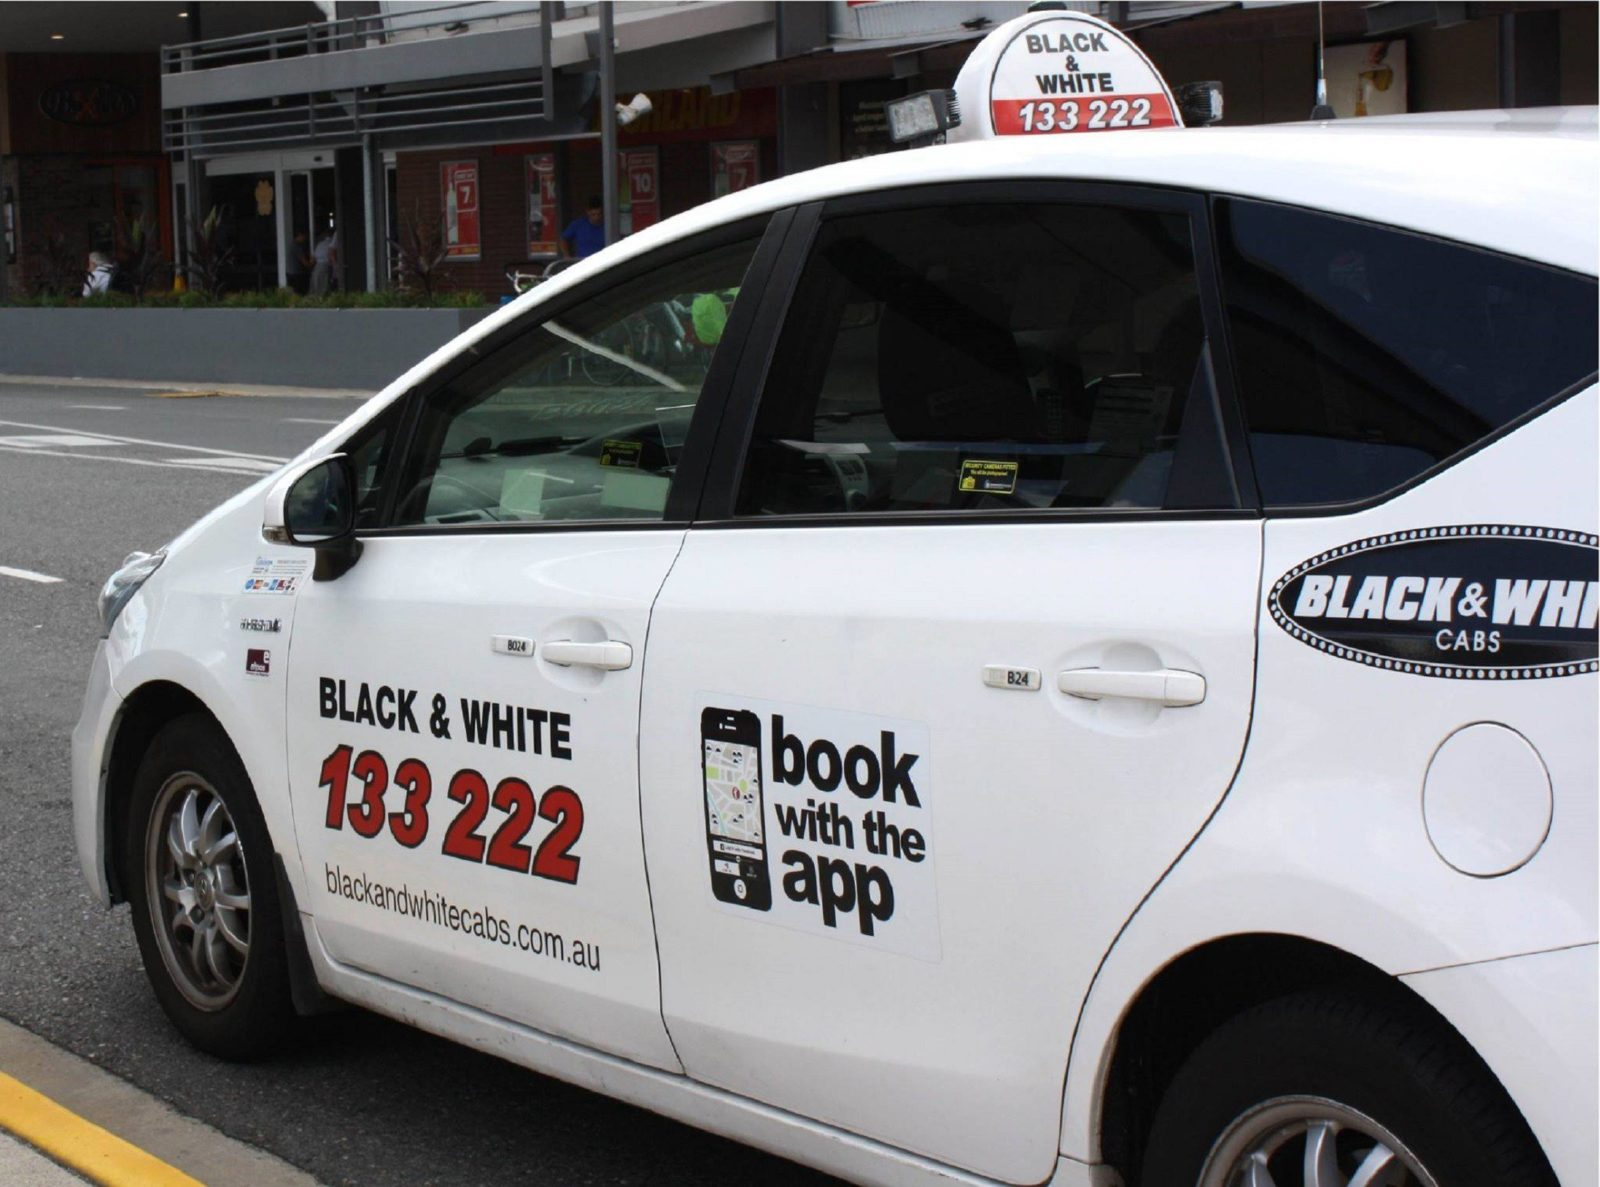 Black & White Cabs, Perth, Western Australia